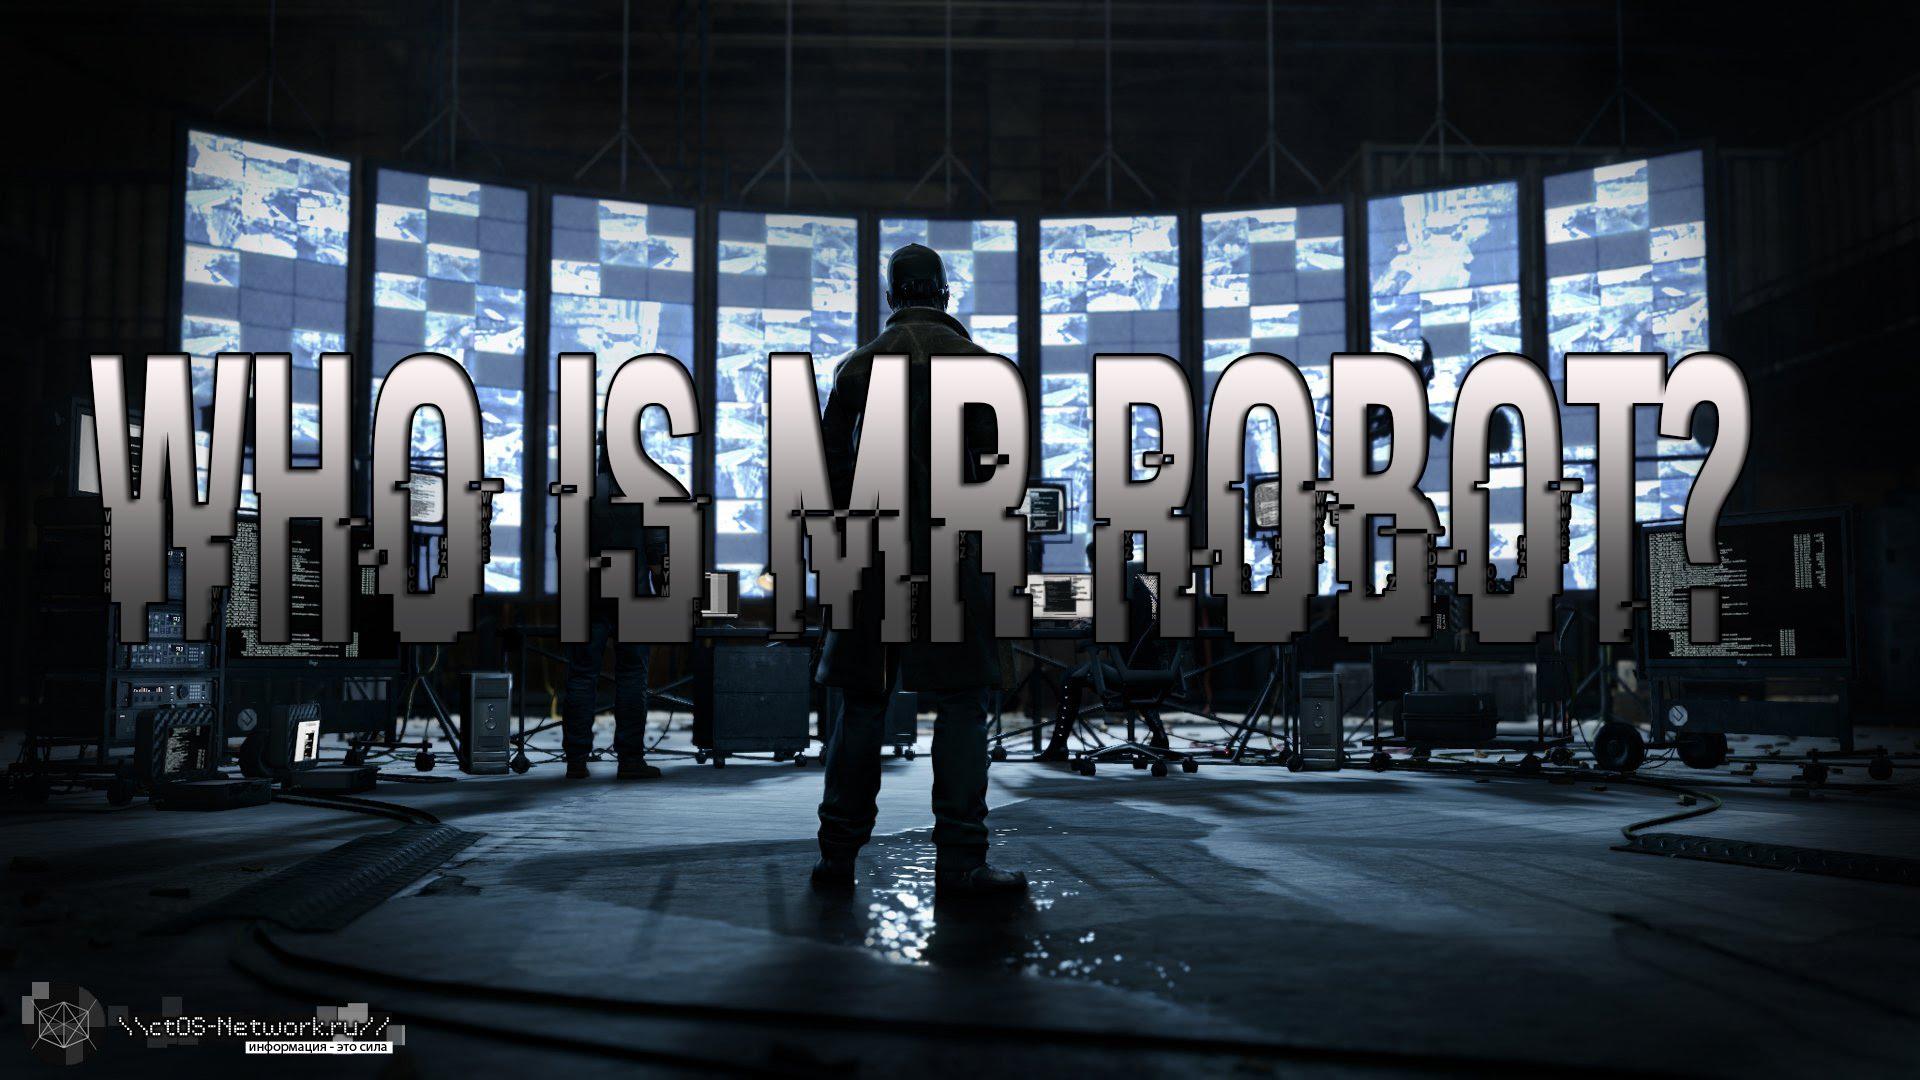 47+ Mr Robot iPhone Wallpaper on WallpaperSafari